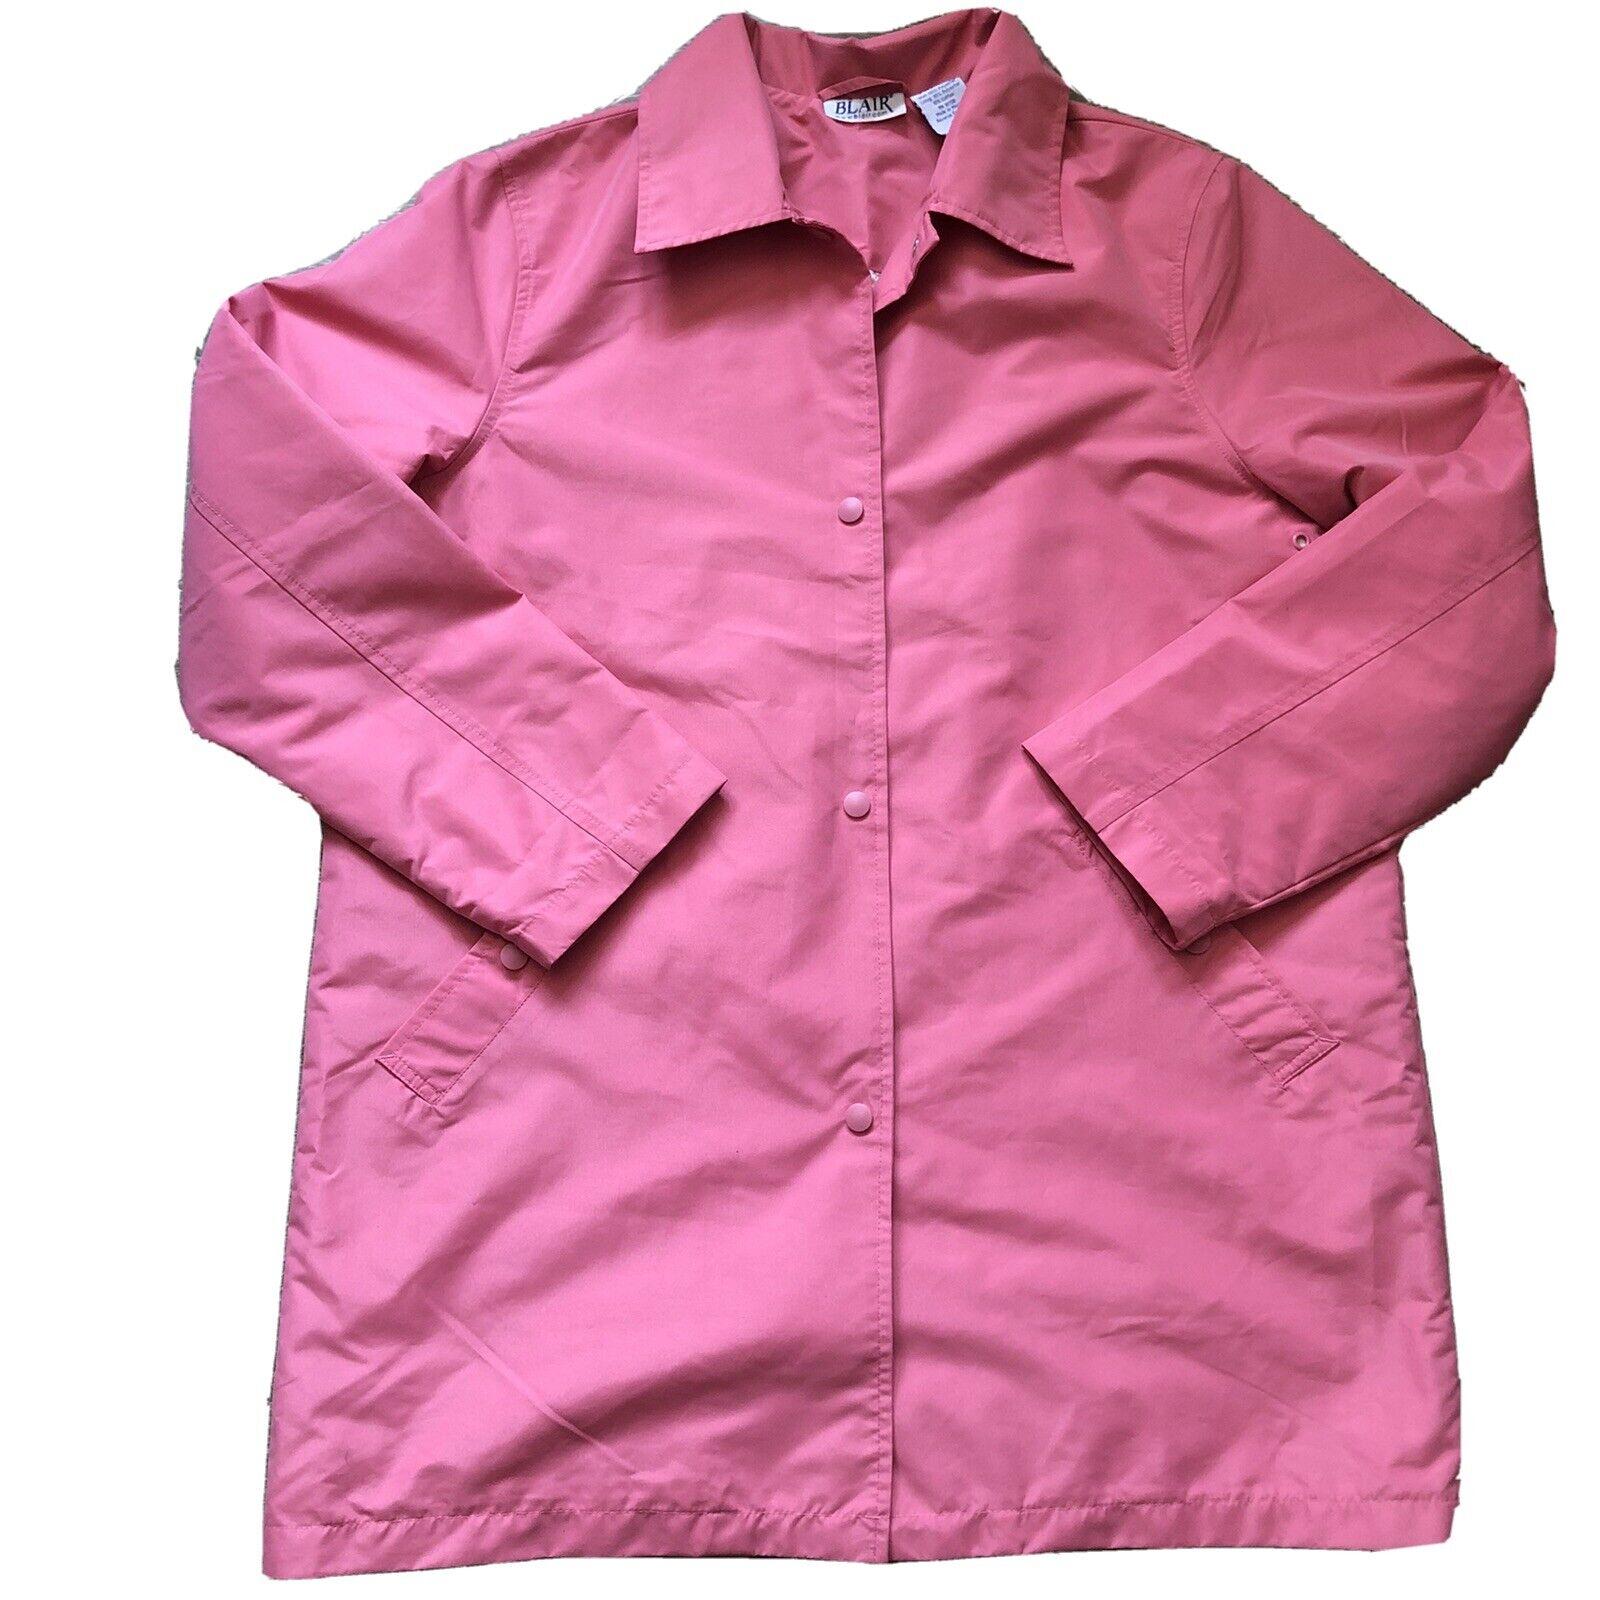 Blair Pink Water Resistant Poplin Spring Jacket Trench Raincoat Floral Lining